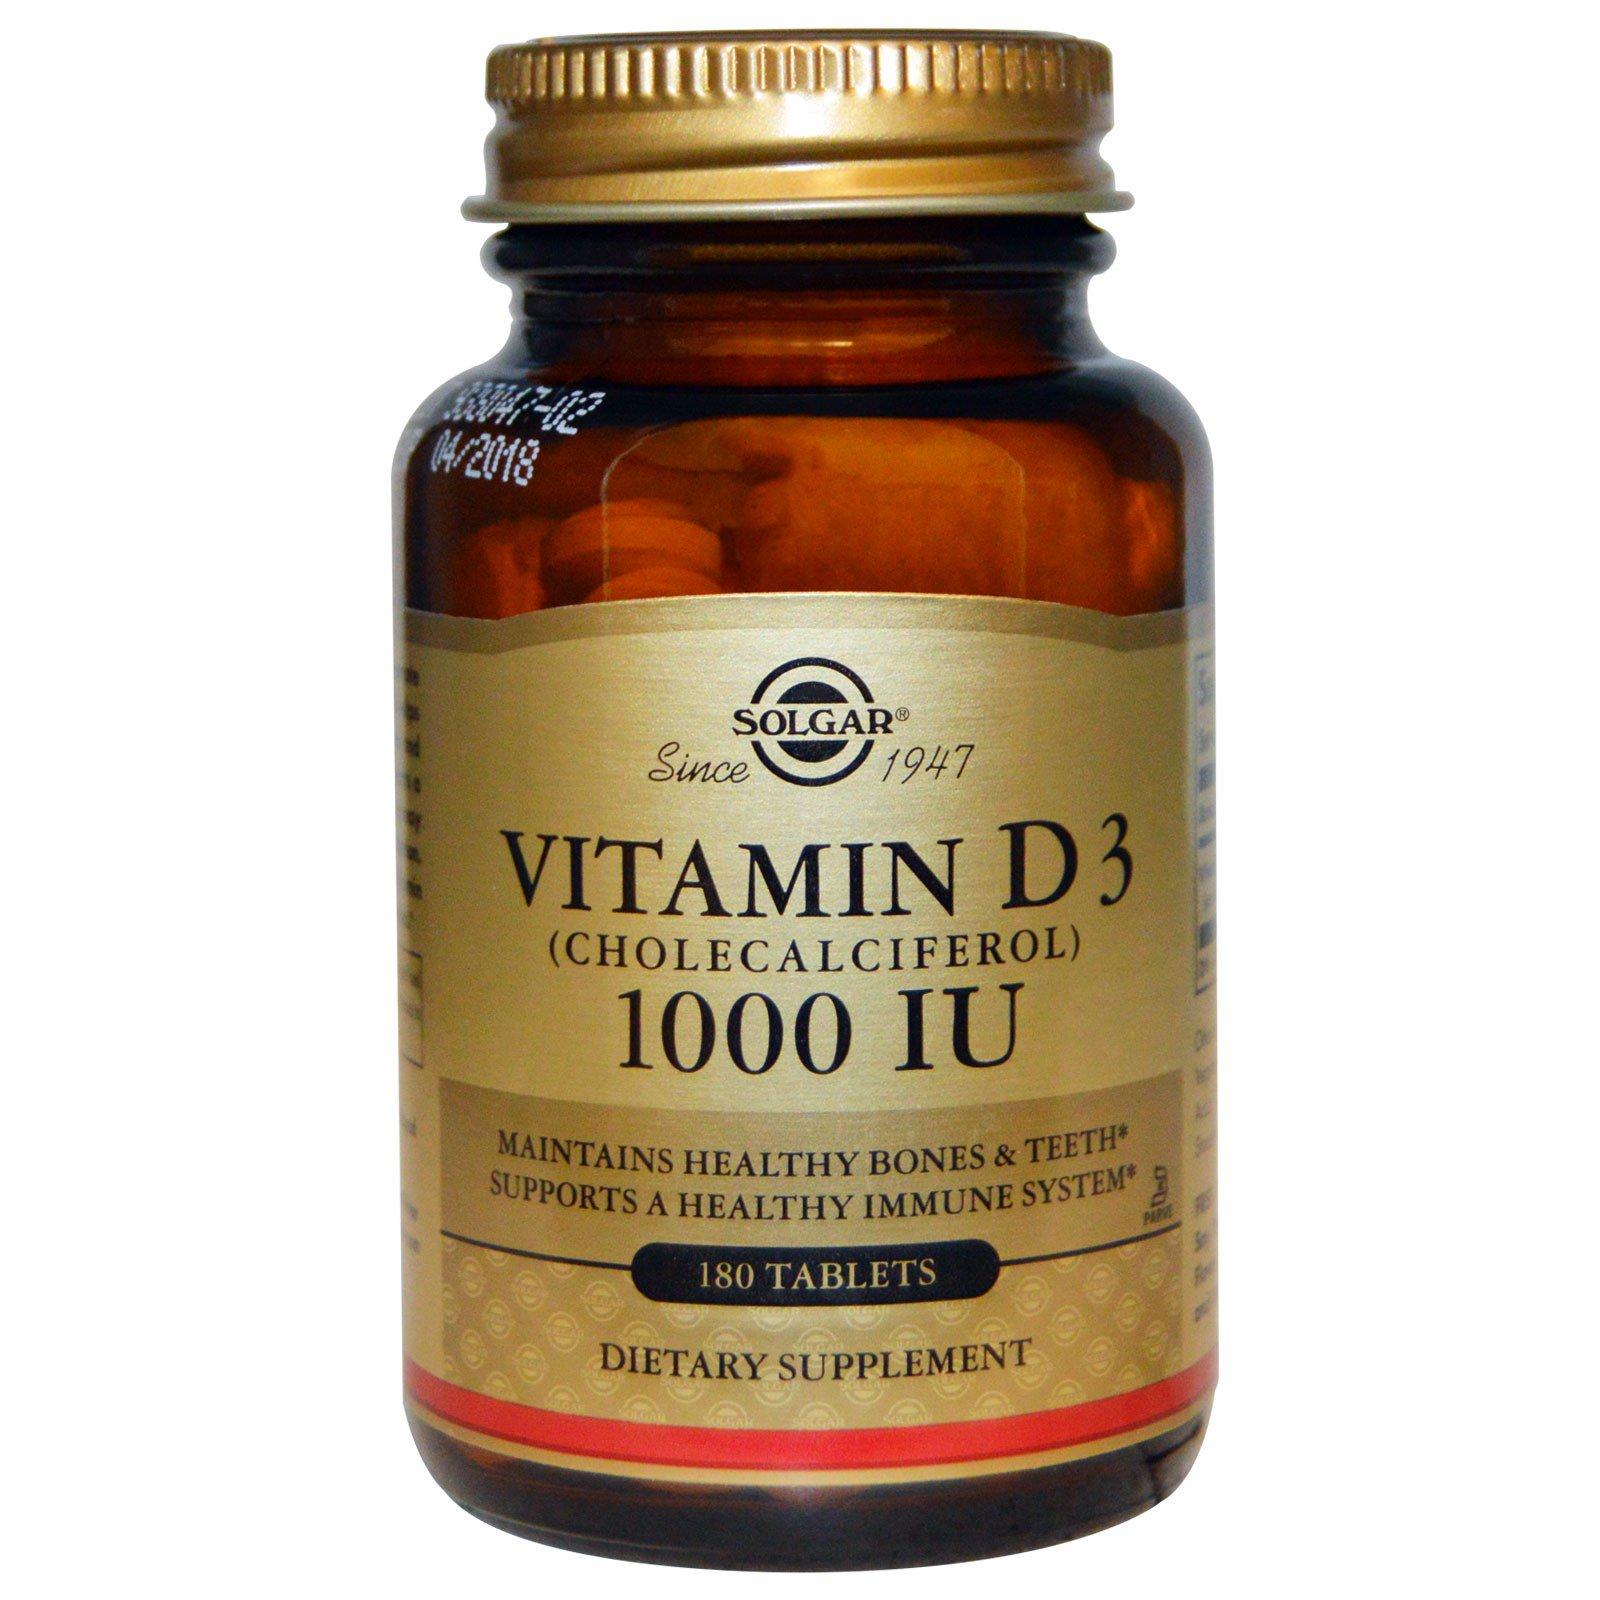 solgar vitamin d3 cholecalciferol 1000 iu 180 tablets. Black Bedroom Furniture Sets. Home Design Ideas